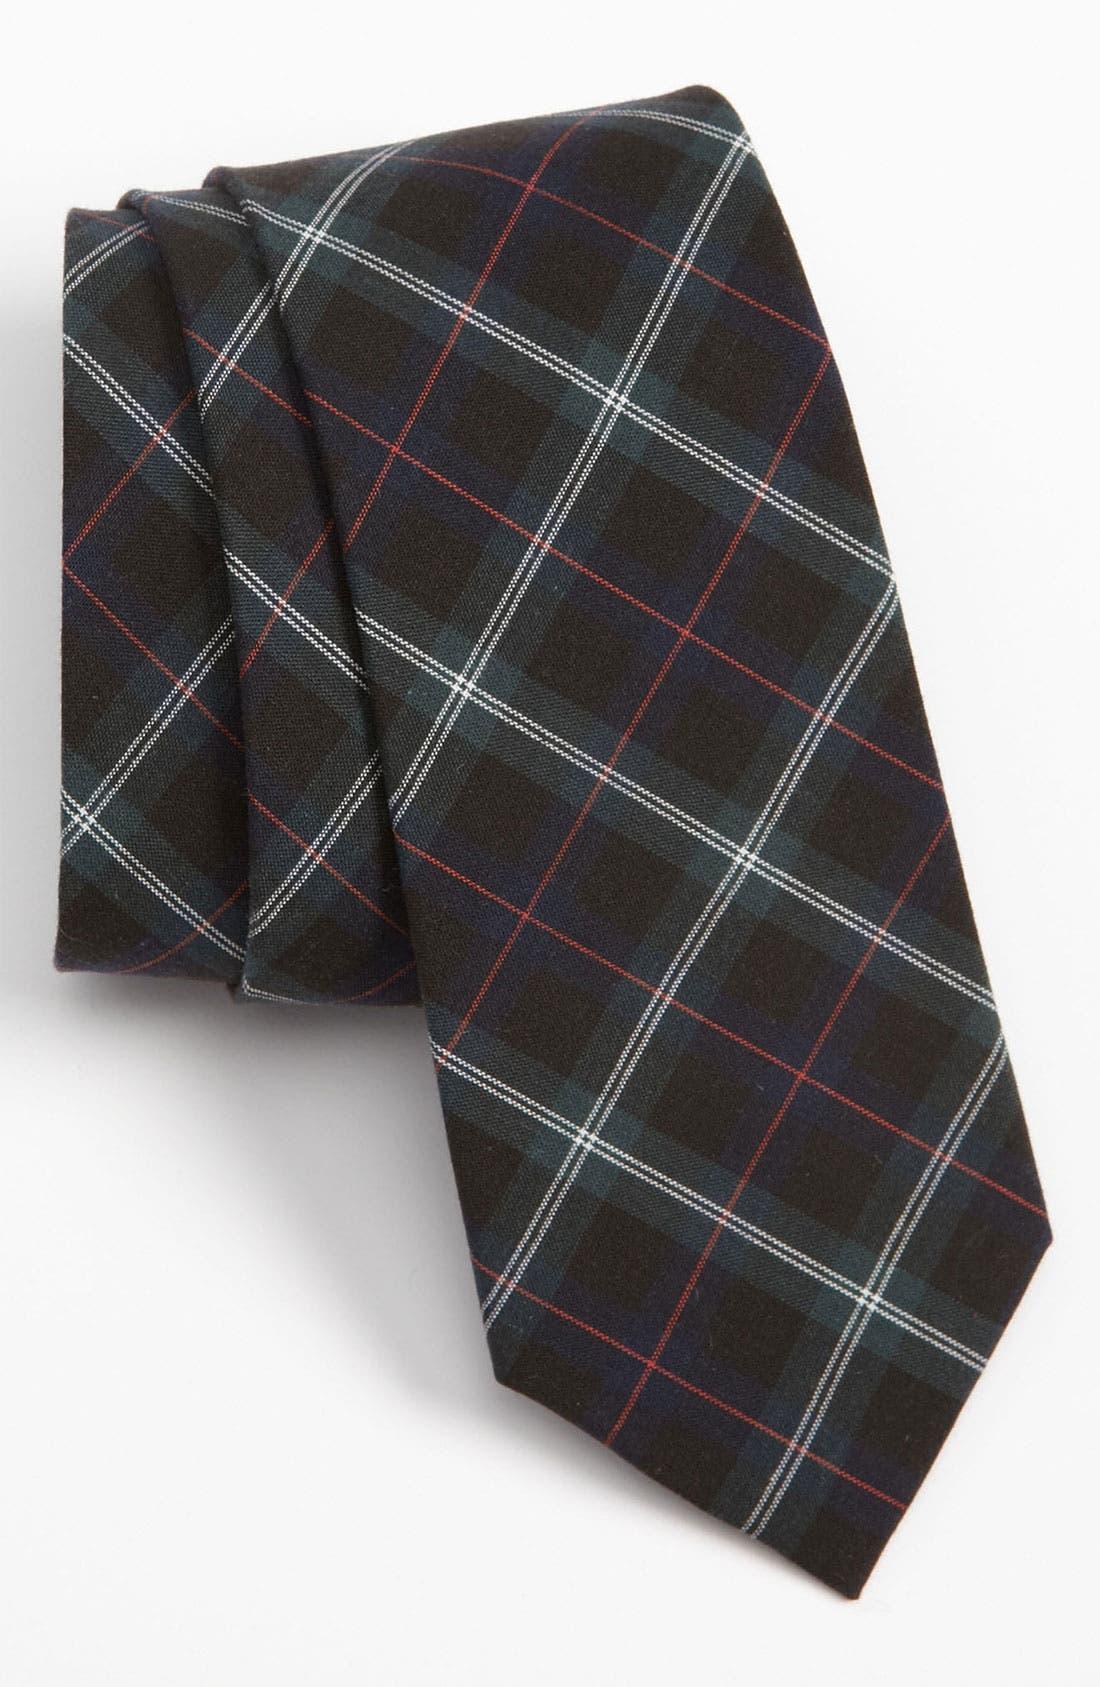 Main Image - The Tie Bar Woven Cotton Tie (Online Exclusive)